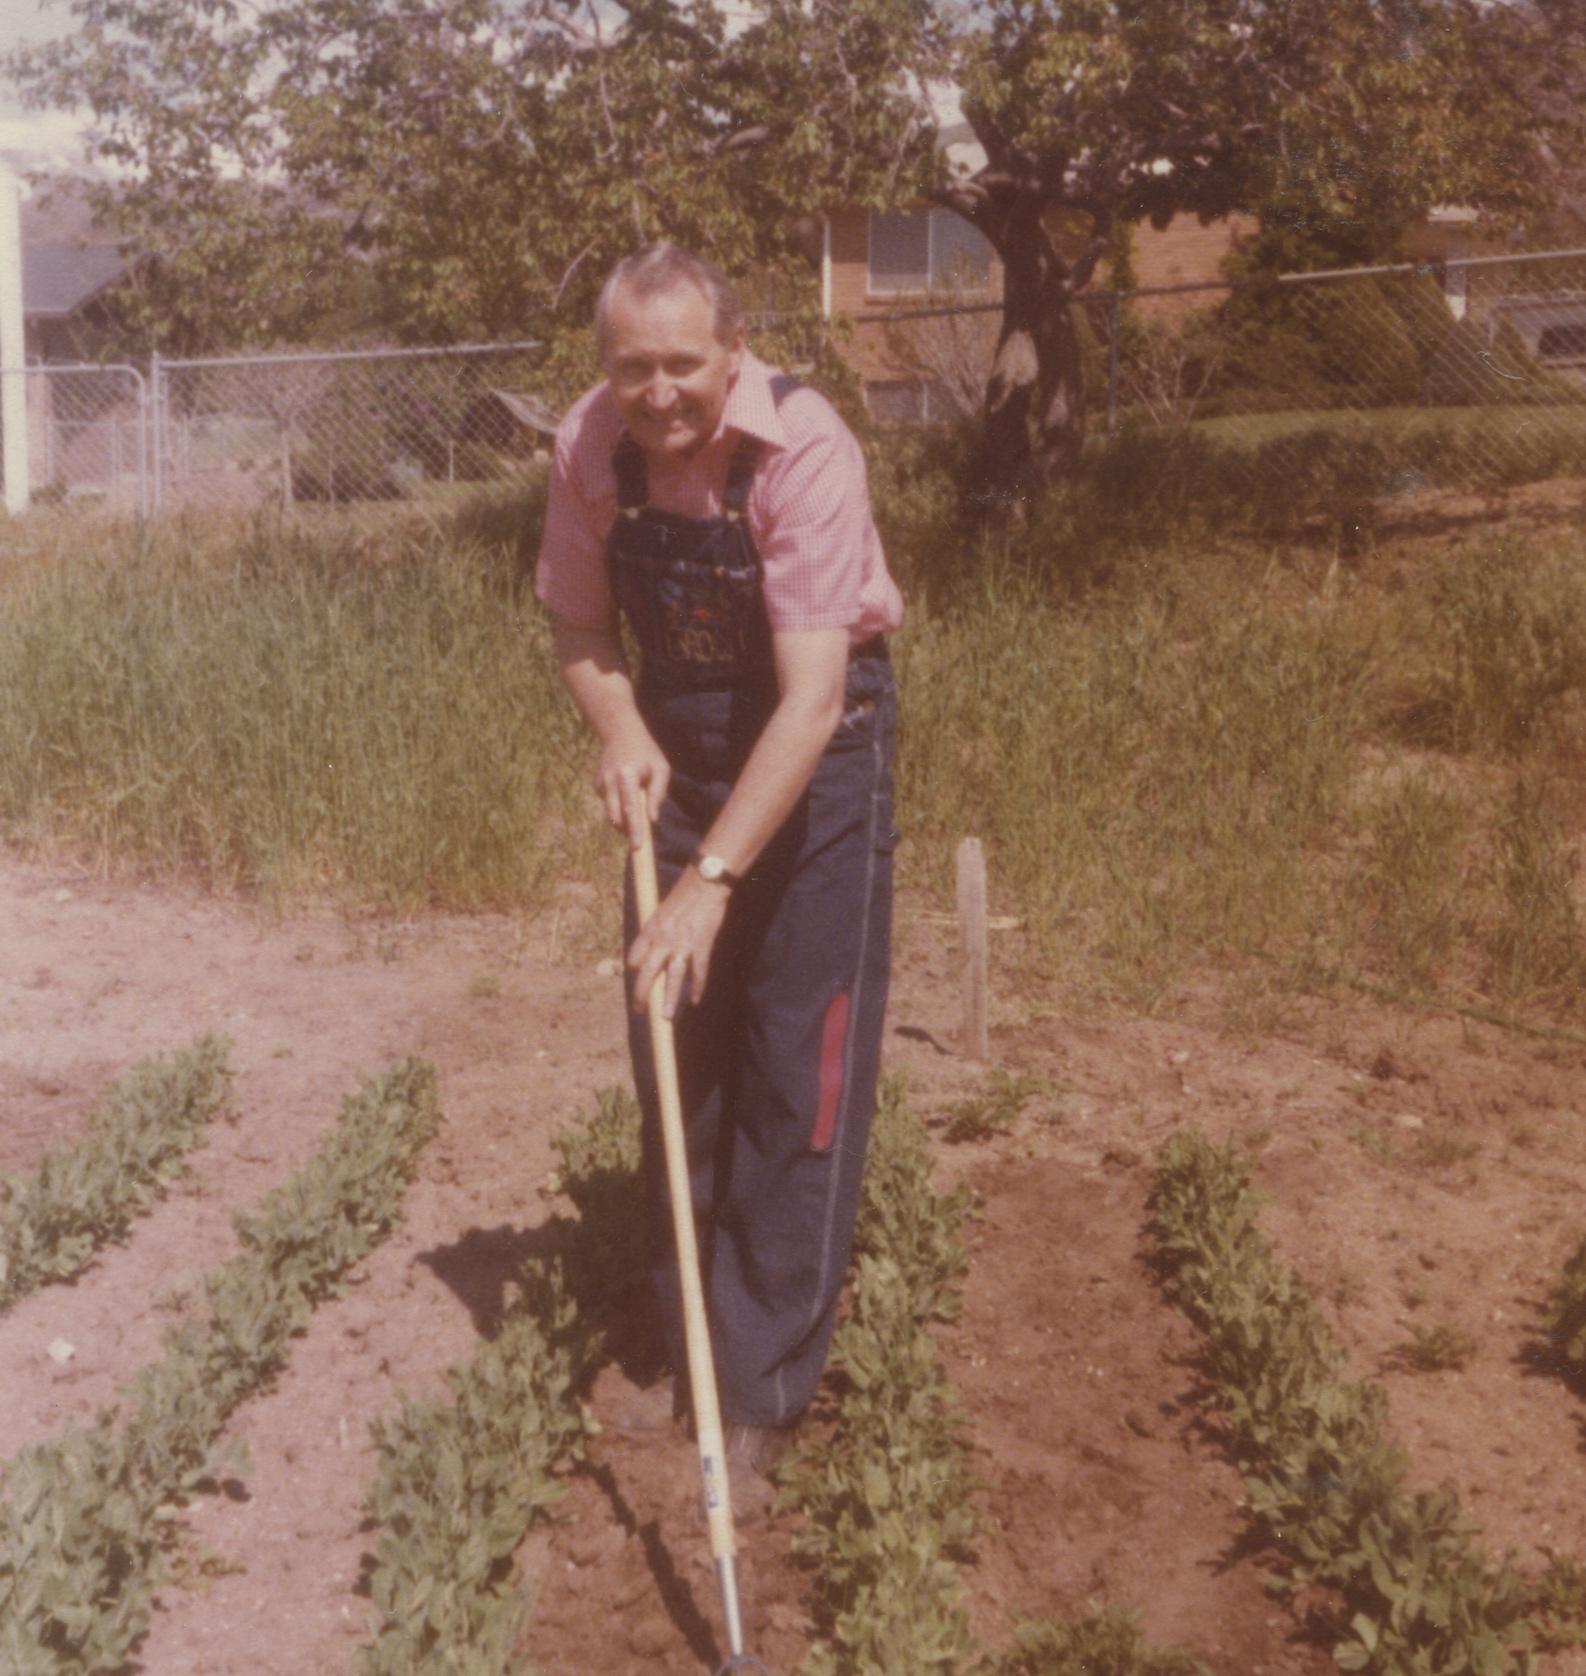 Elder L. Tom Perry hoes in his garden in Bountiful.